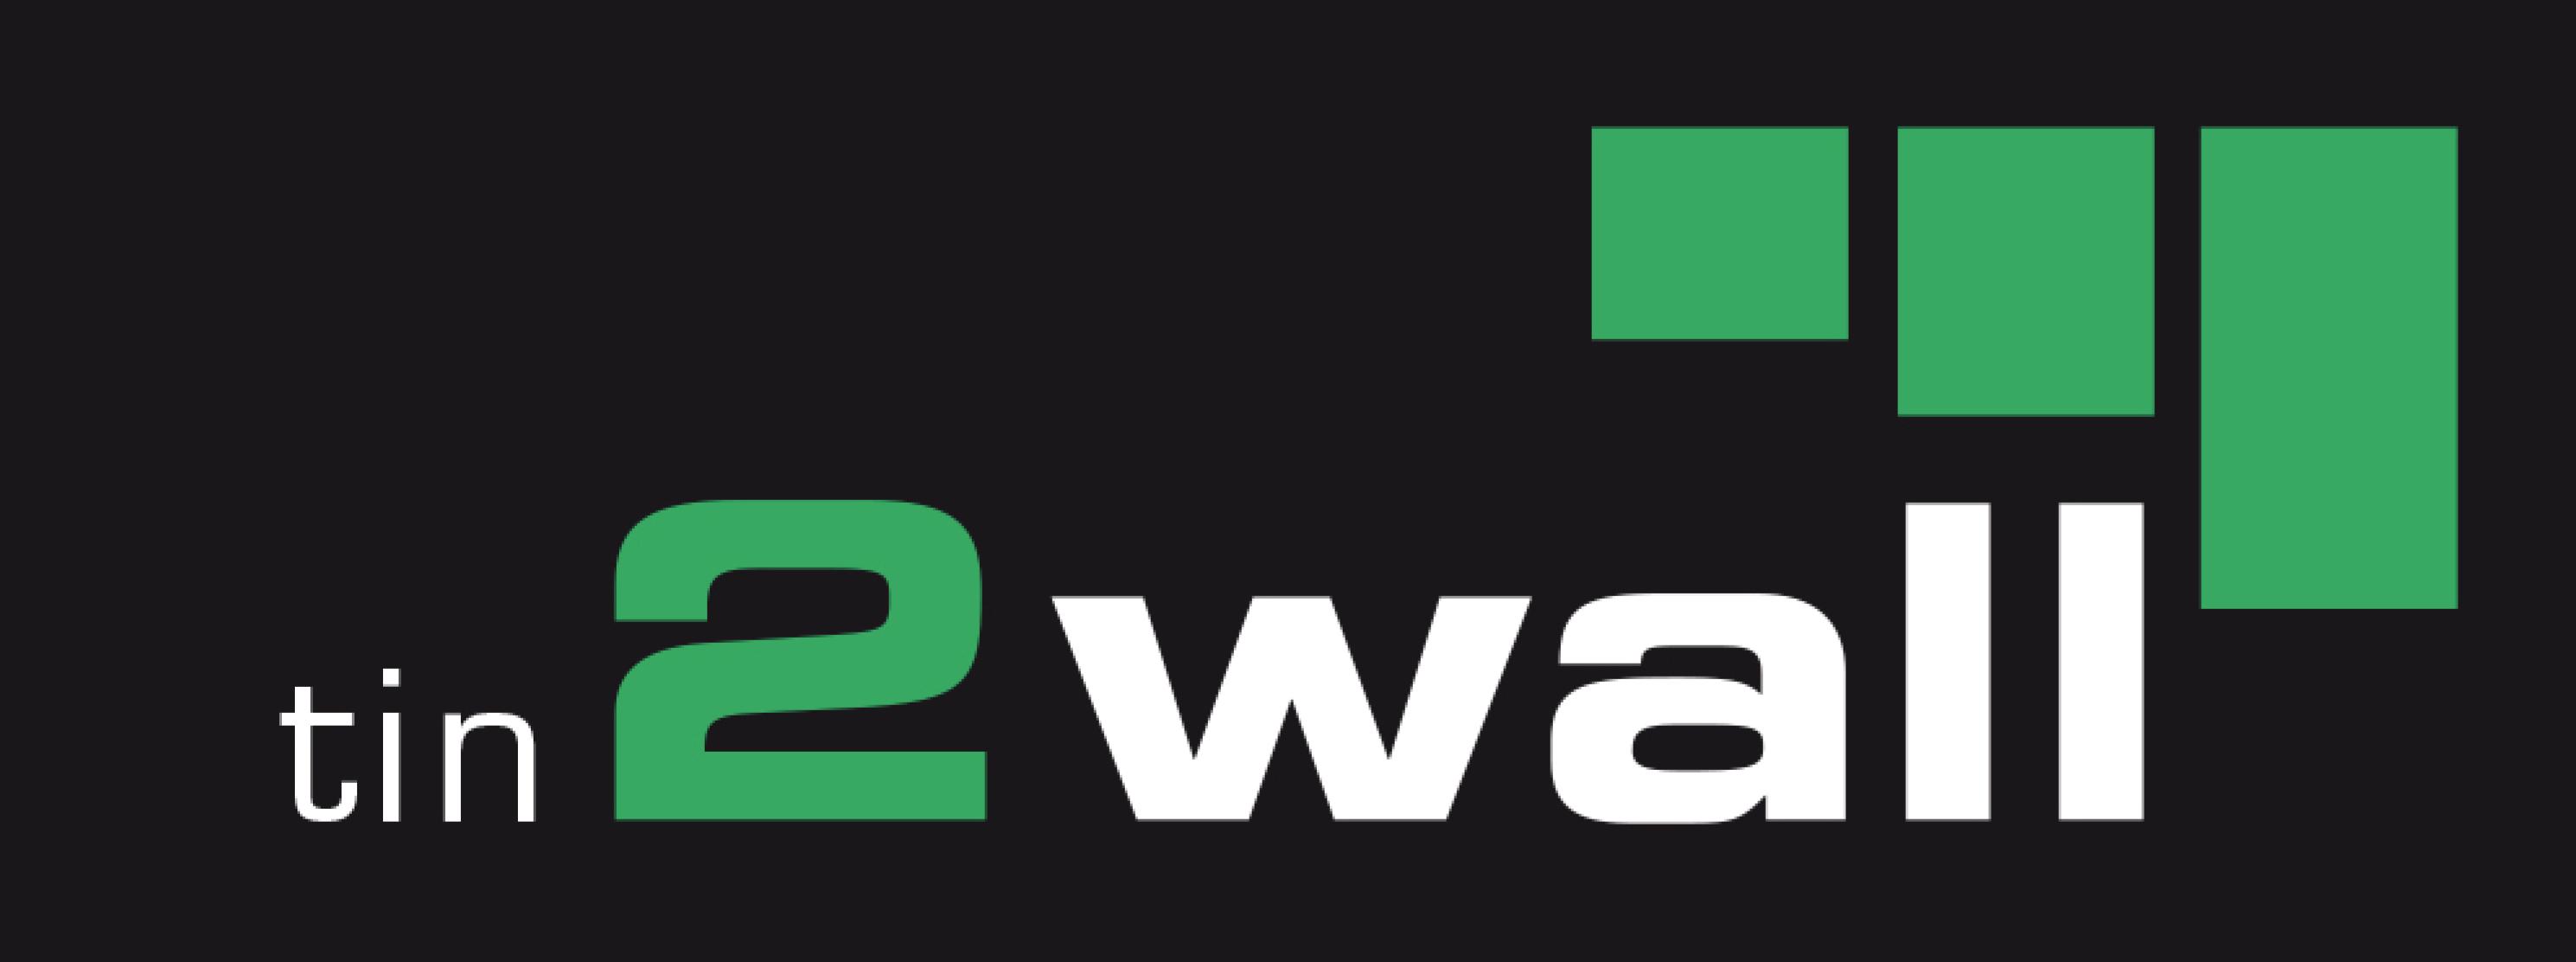 tin2wall